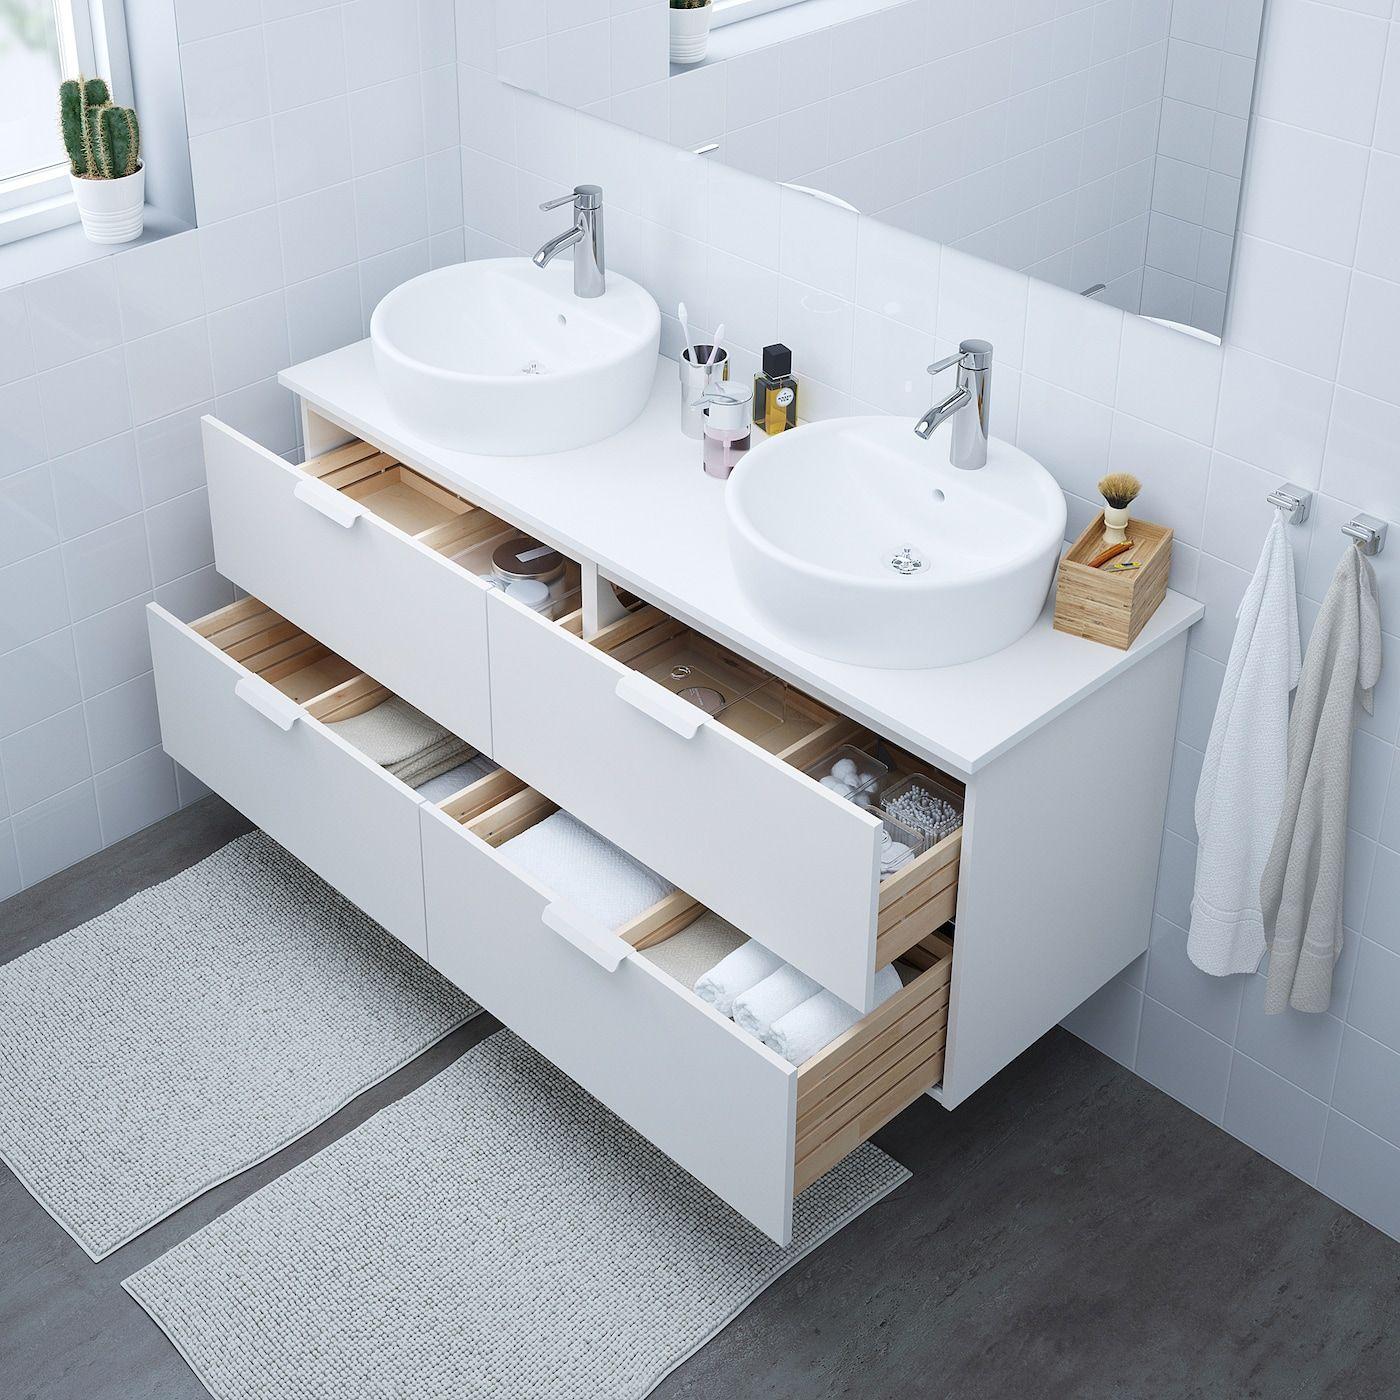 Godmorgon Bathroom Vanity White Canada Ikea In 2020 White Vanity Bathroom Ikea Vanity Ikea Godmorgon